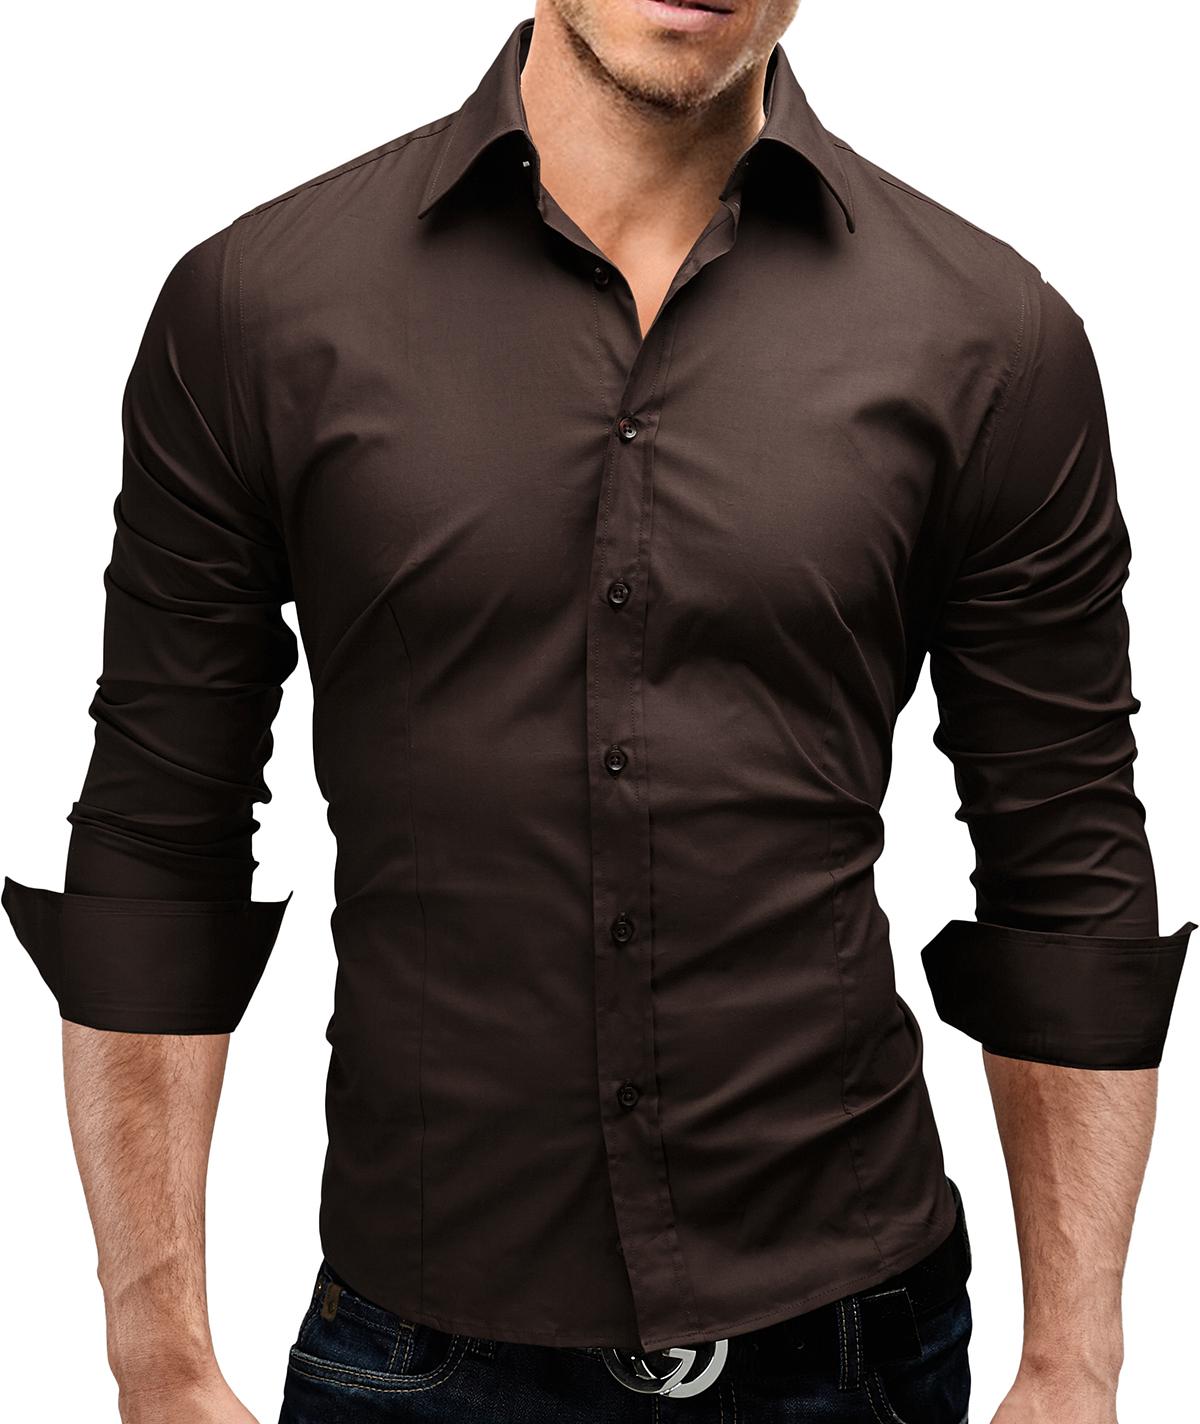 Merish men's shirt 6 model s xxl slim fit new t shirt polo ...